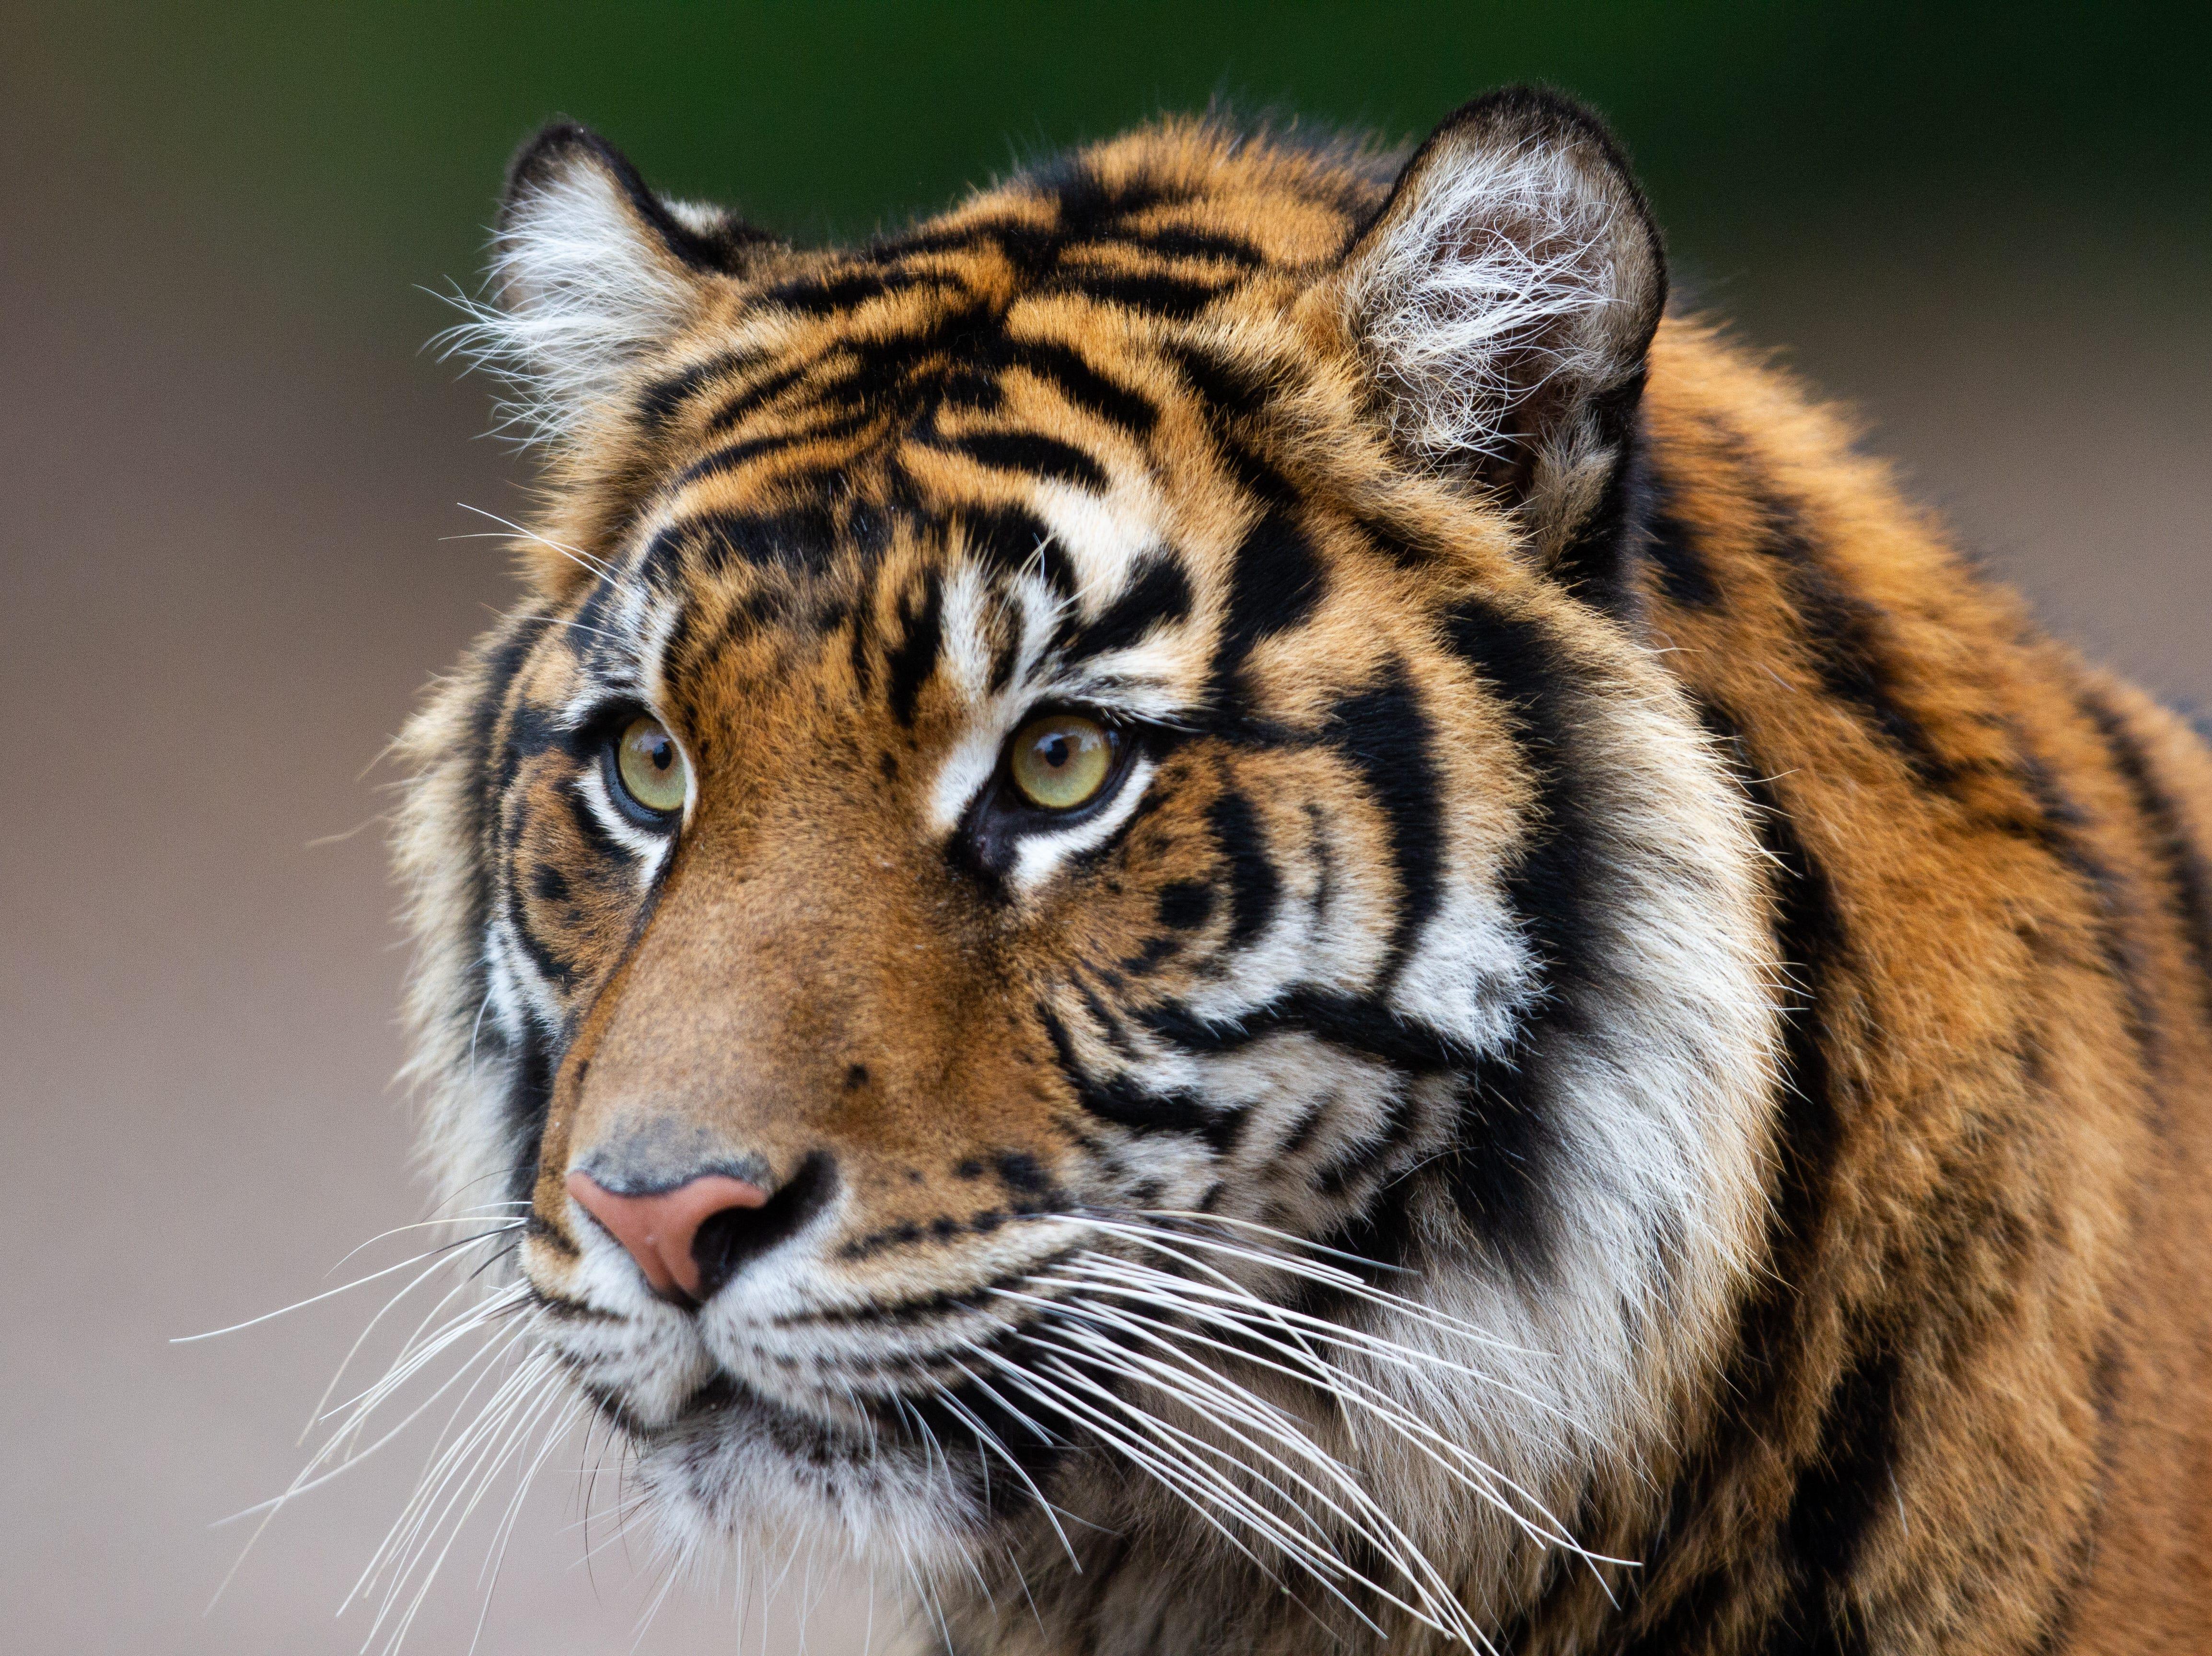 Phoenix Zoo's new Sumatran tiger, Dari, makes official debut